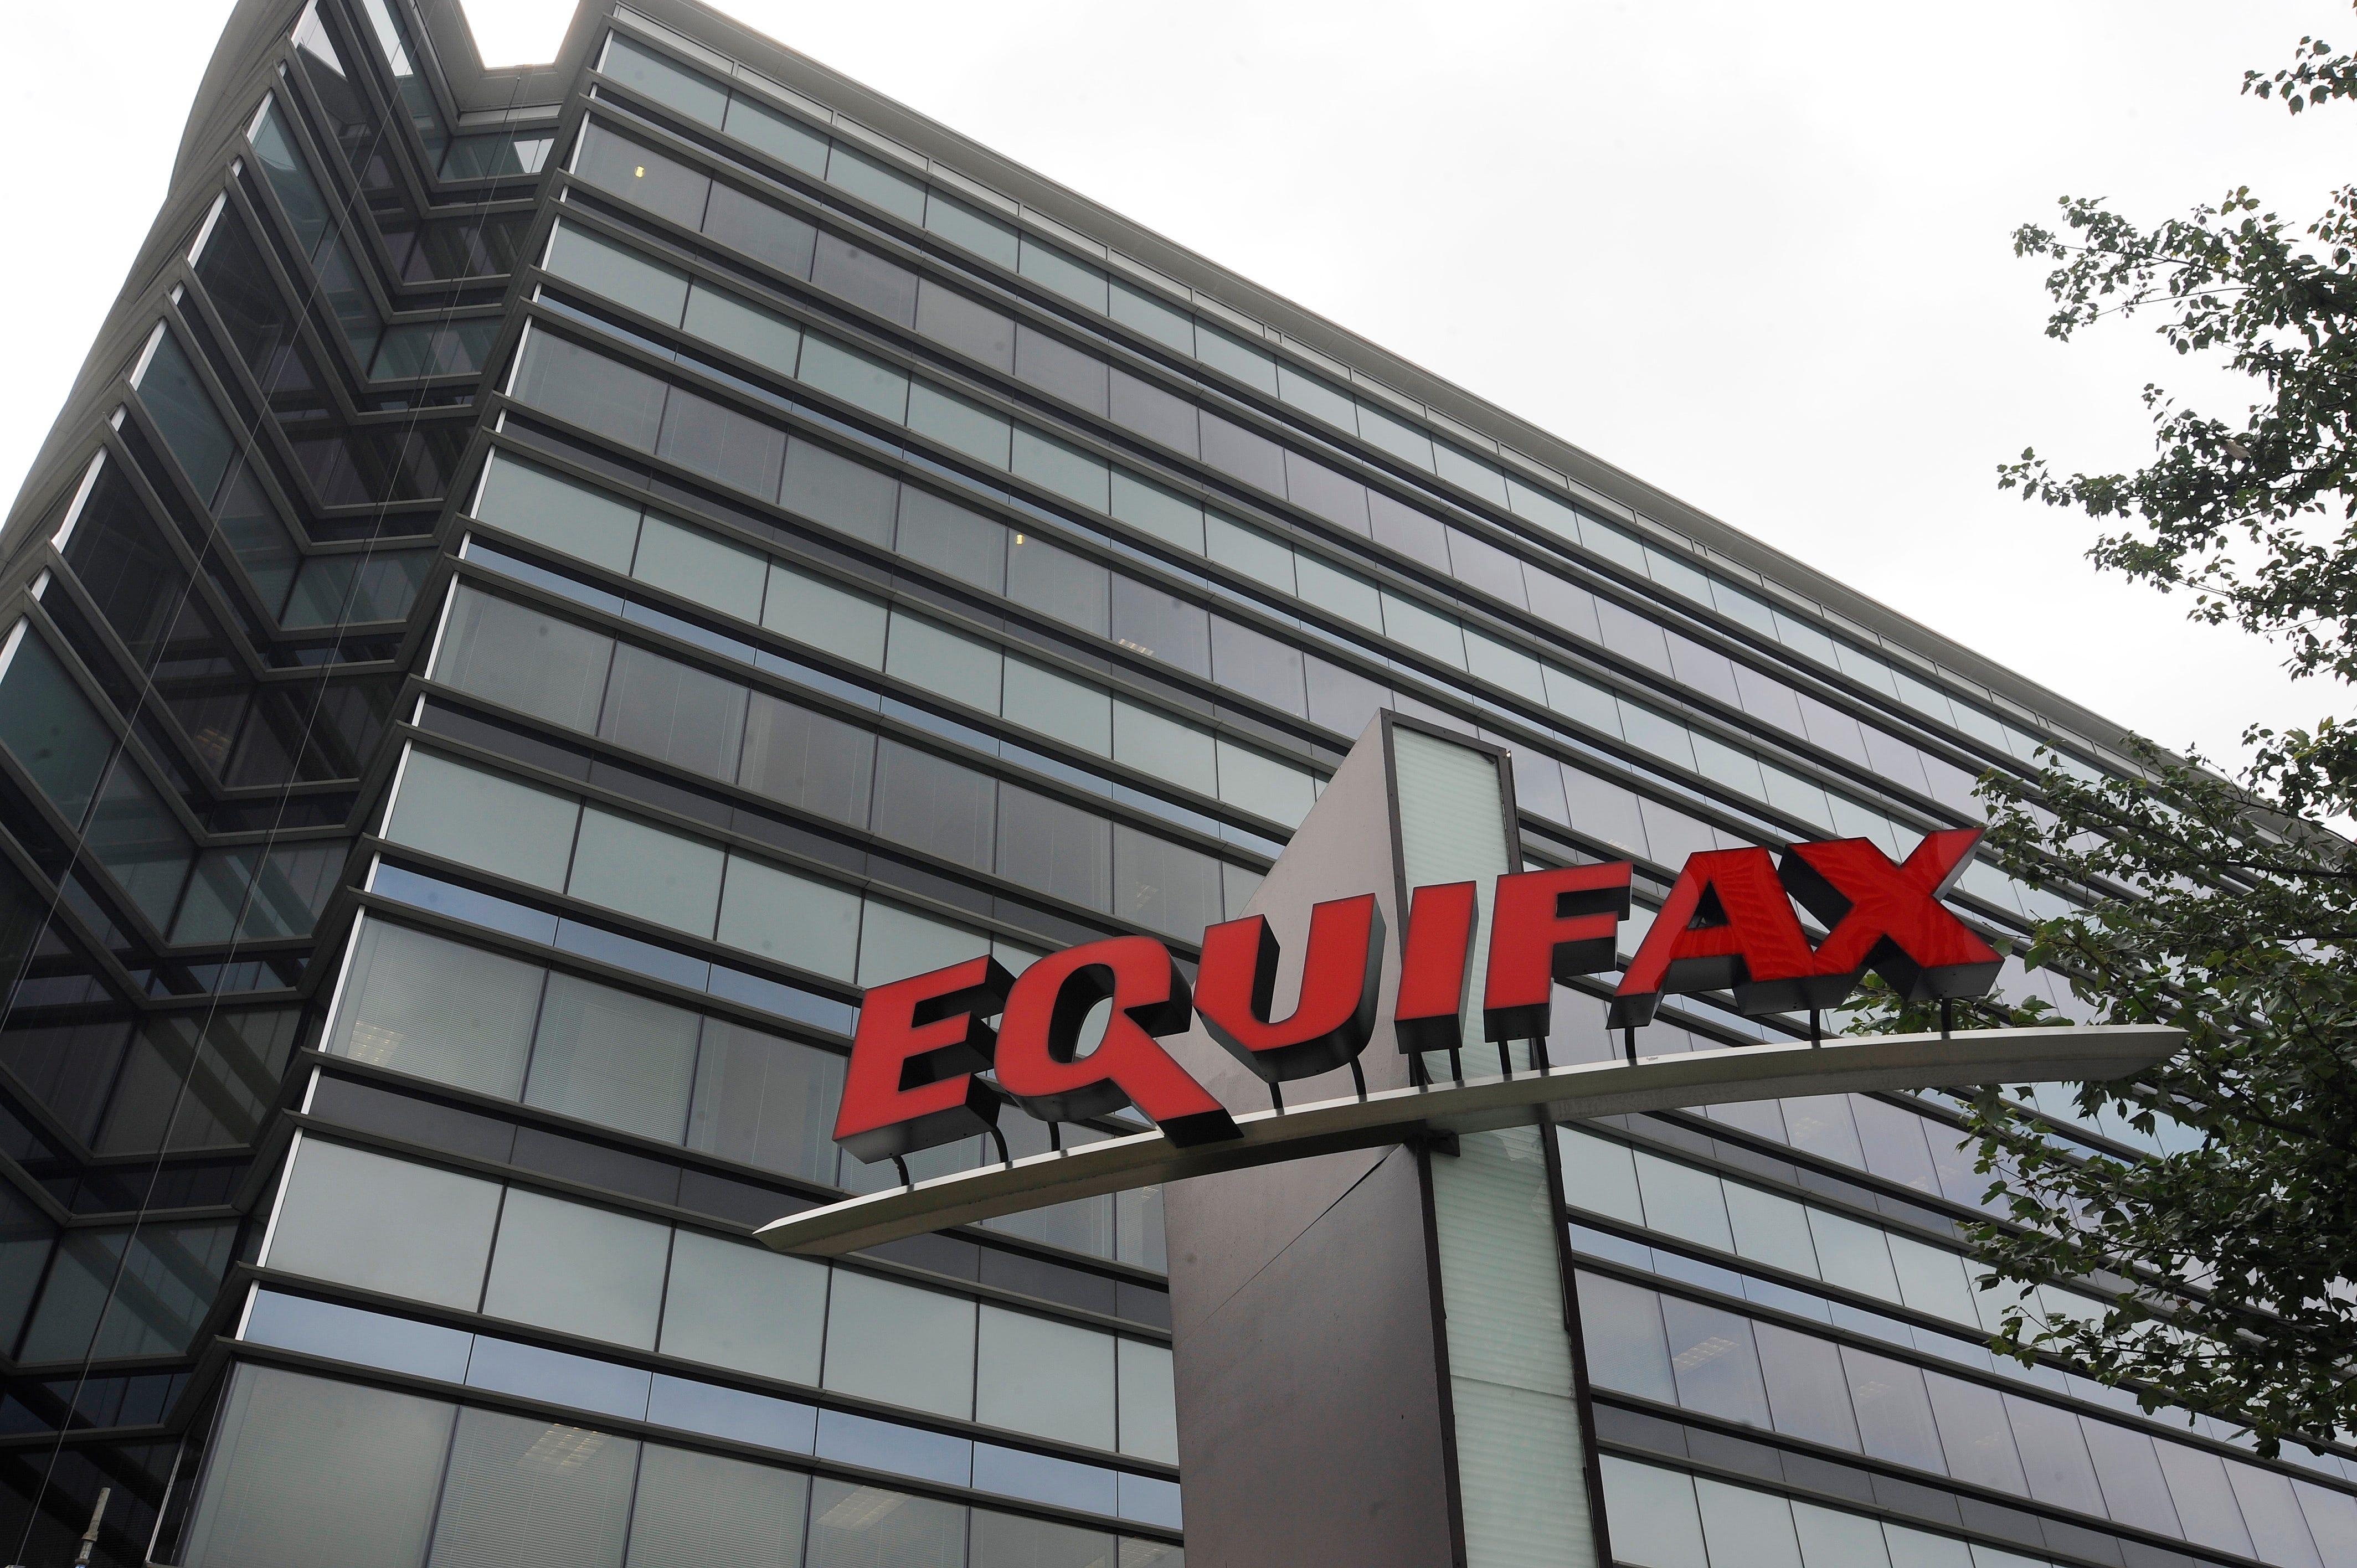 Equifax data breach: How do you fix a cataclysmic crisis?